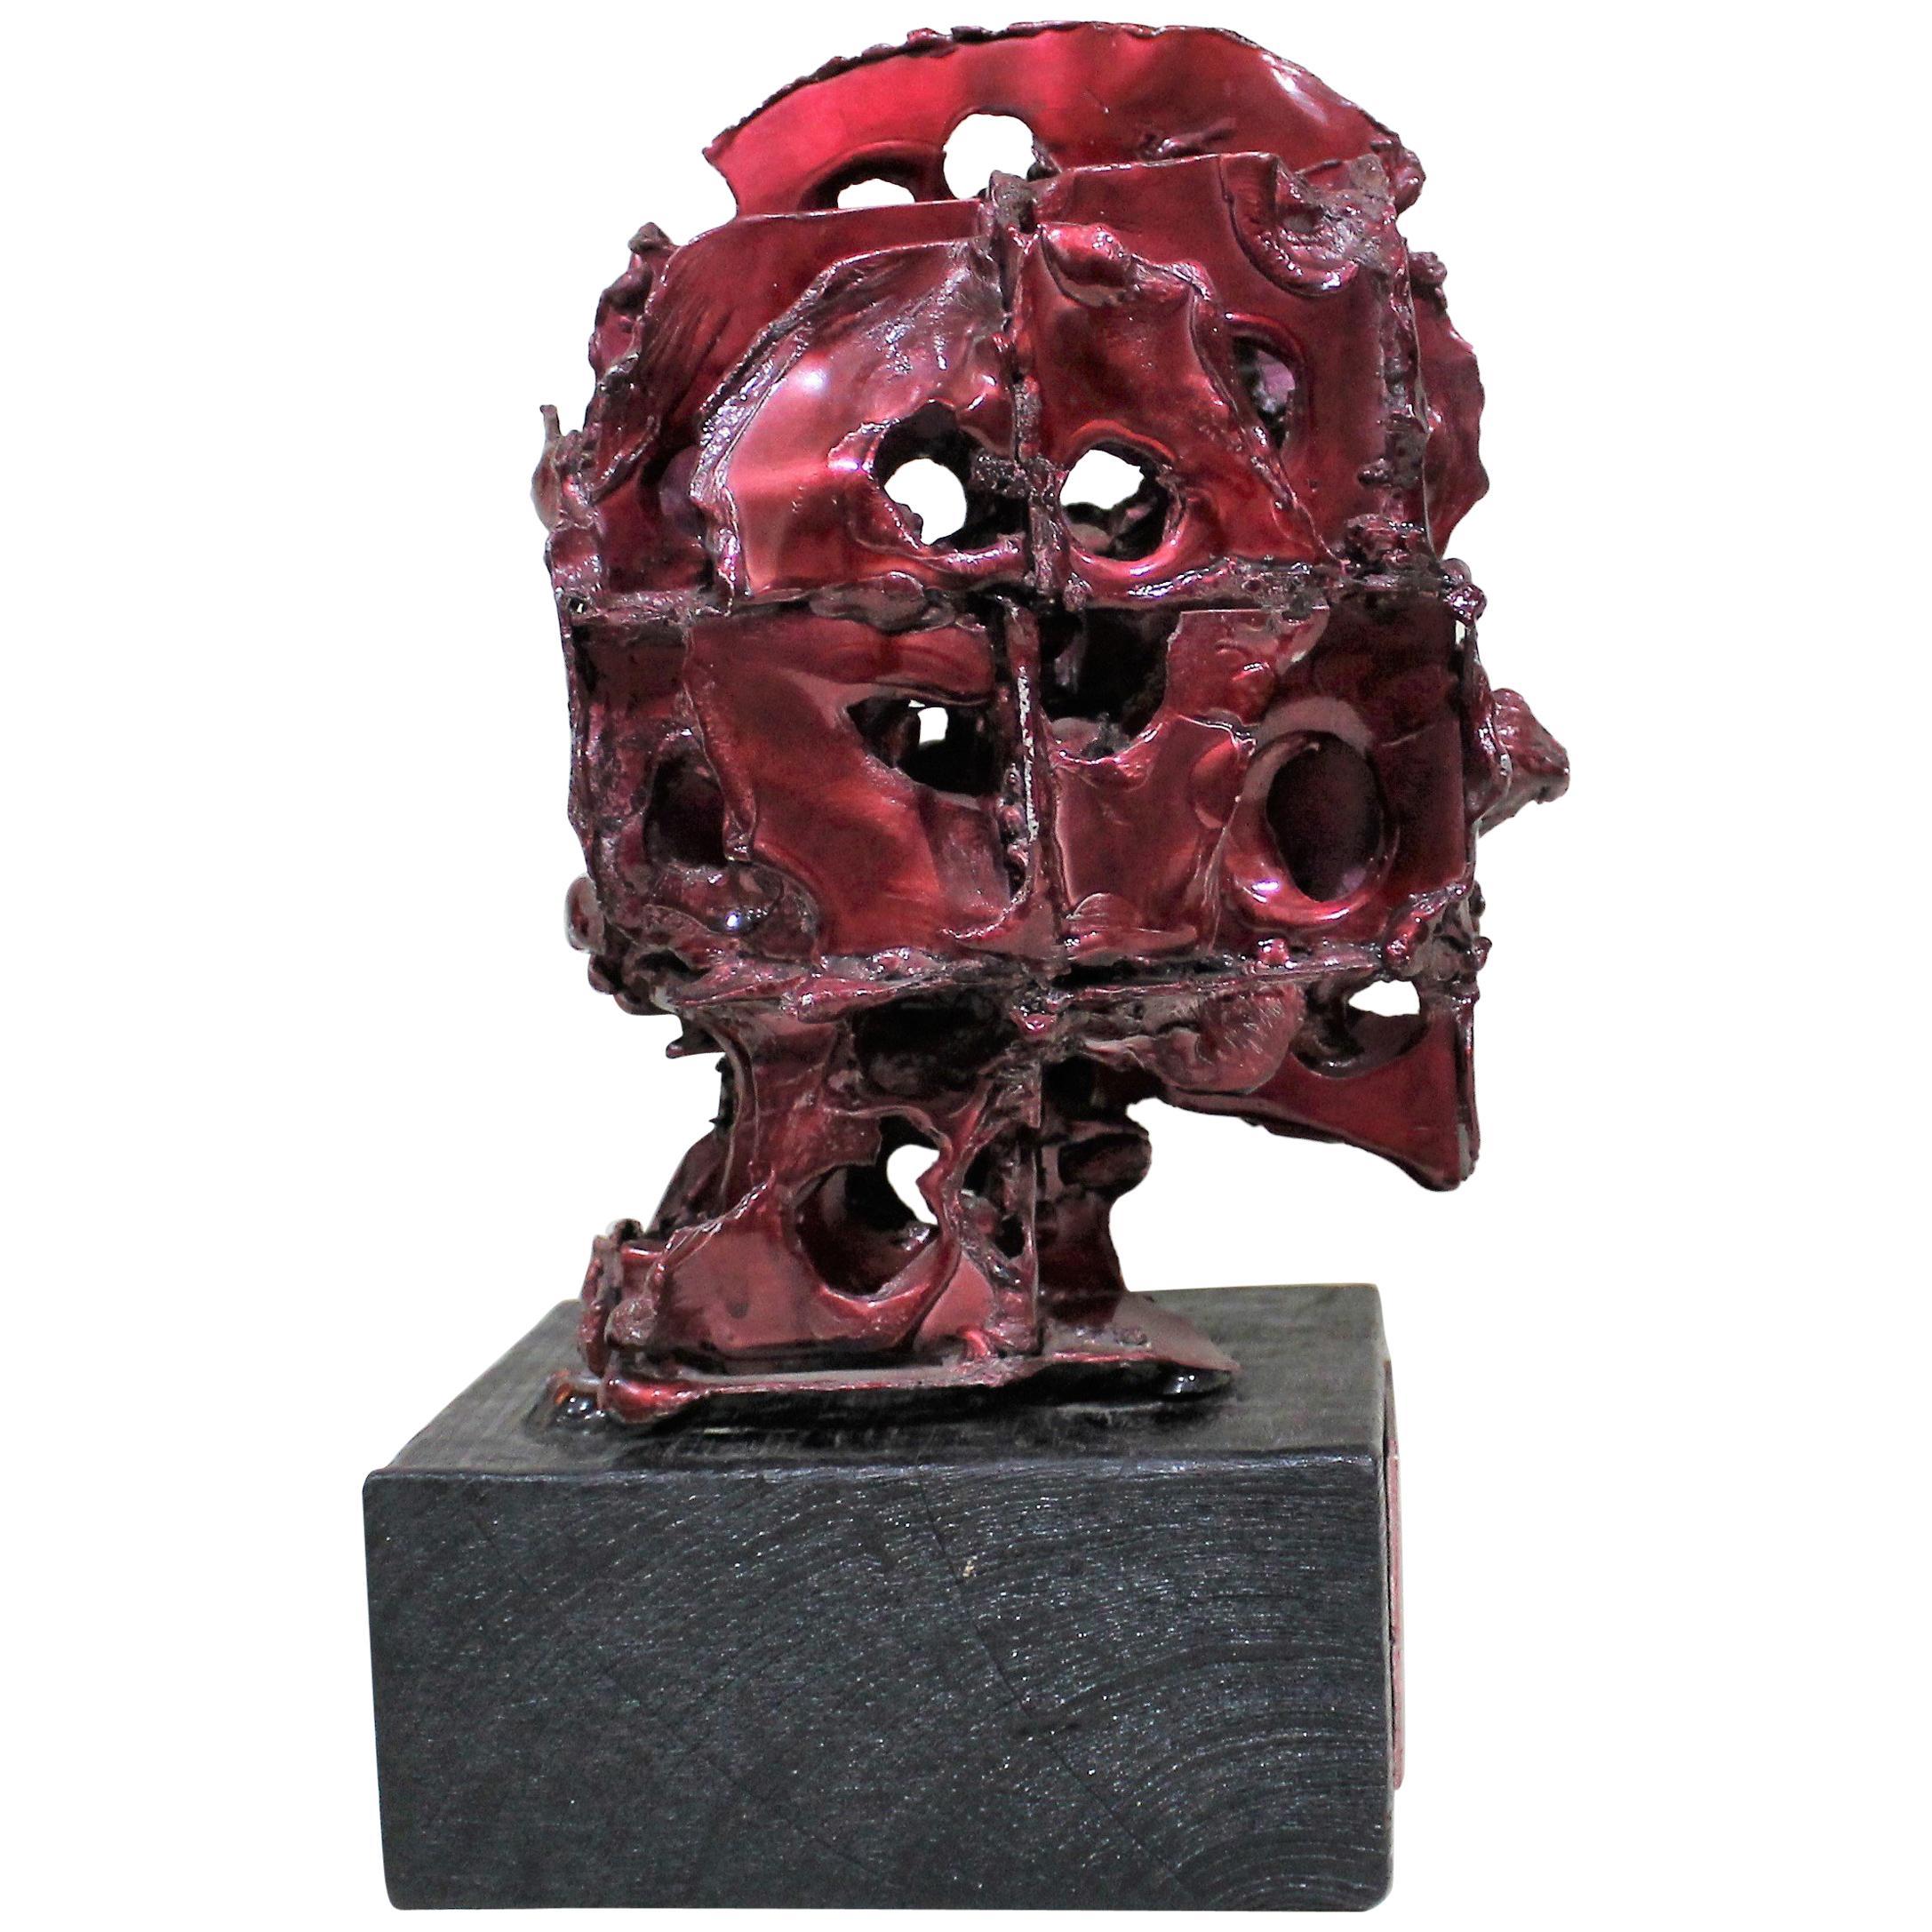 Abstract Brutalistic Metal Sculpture